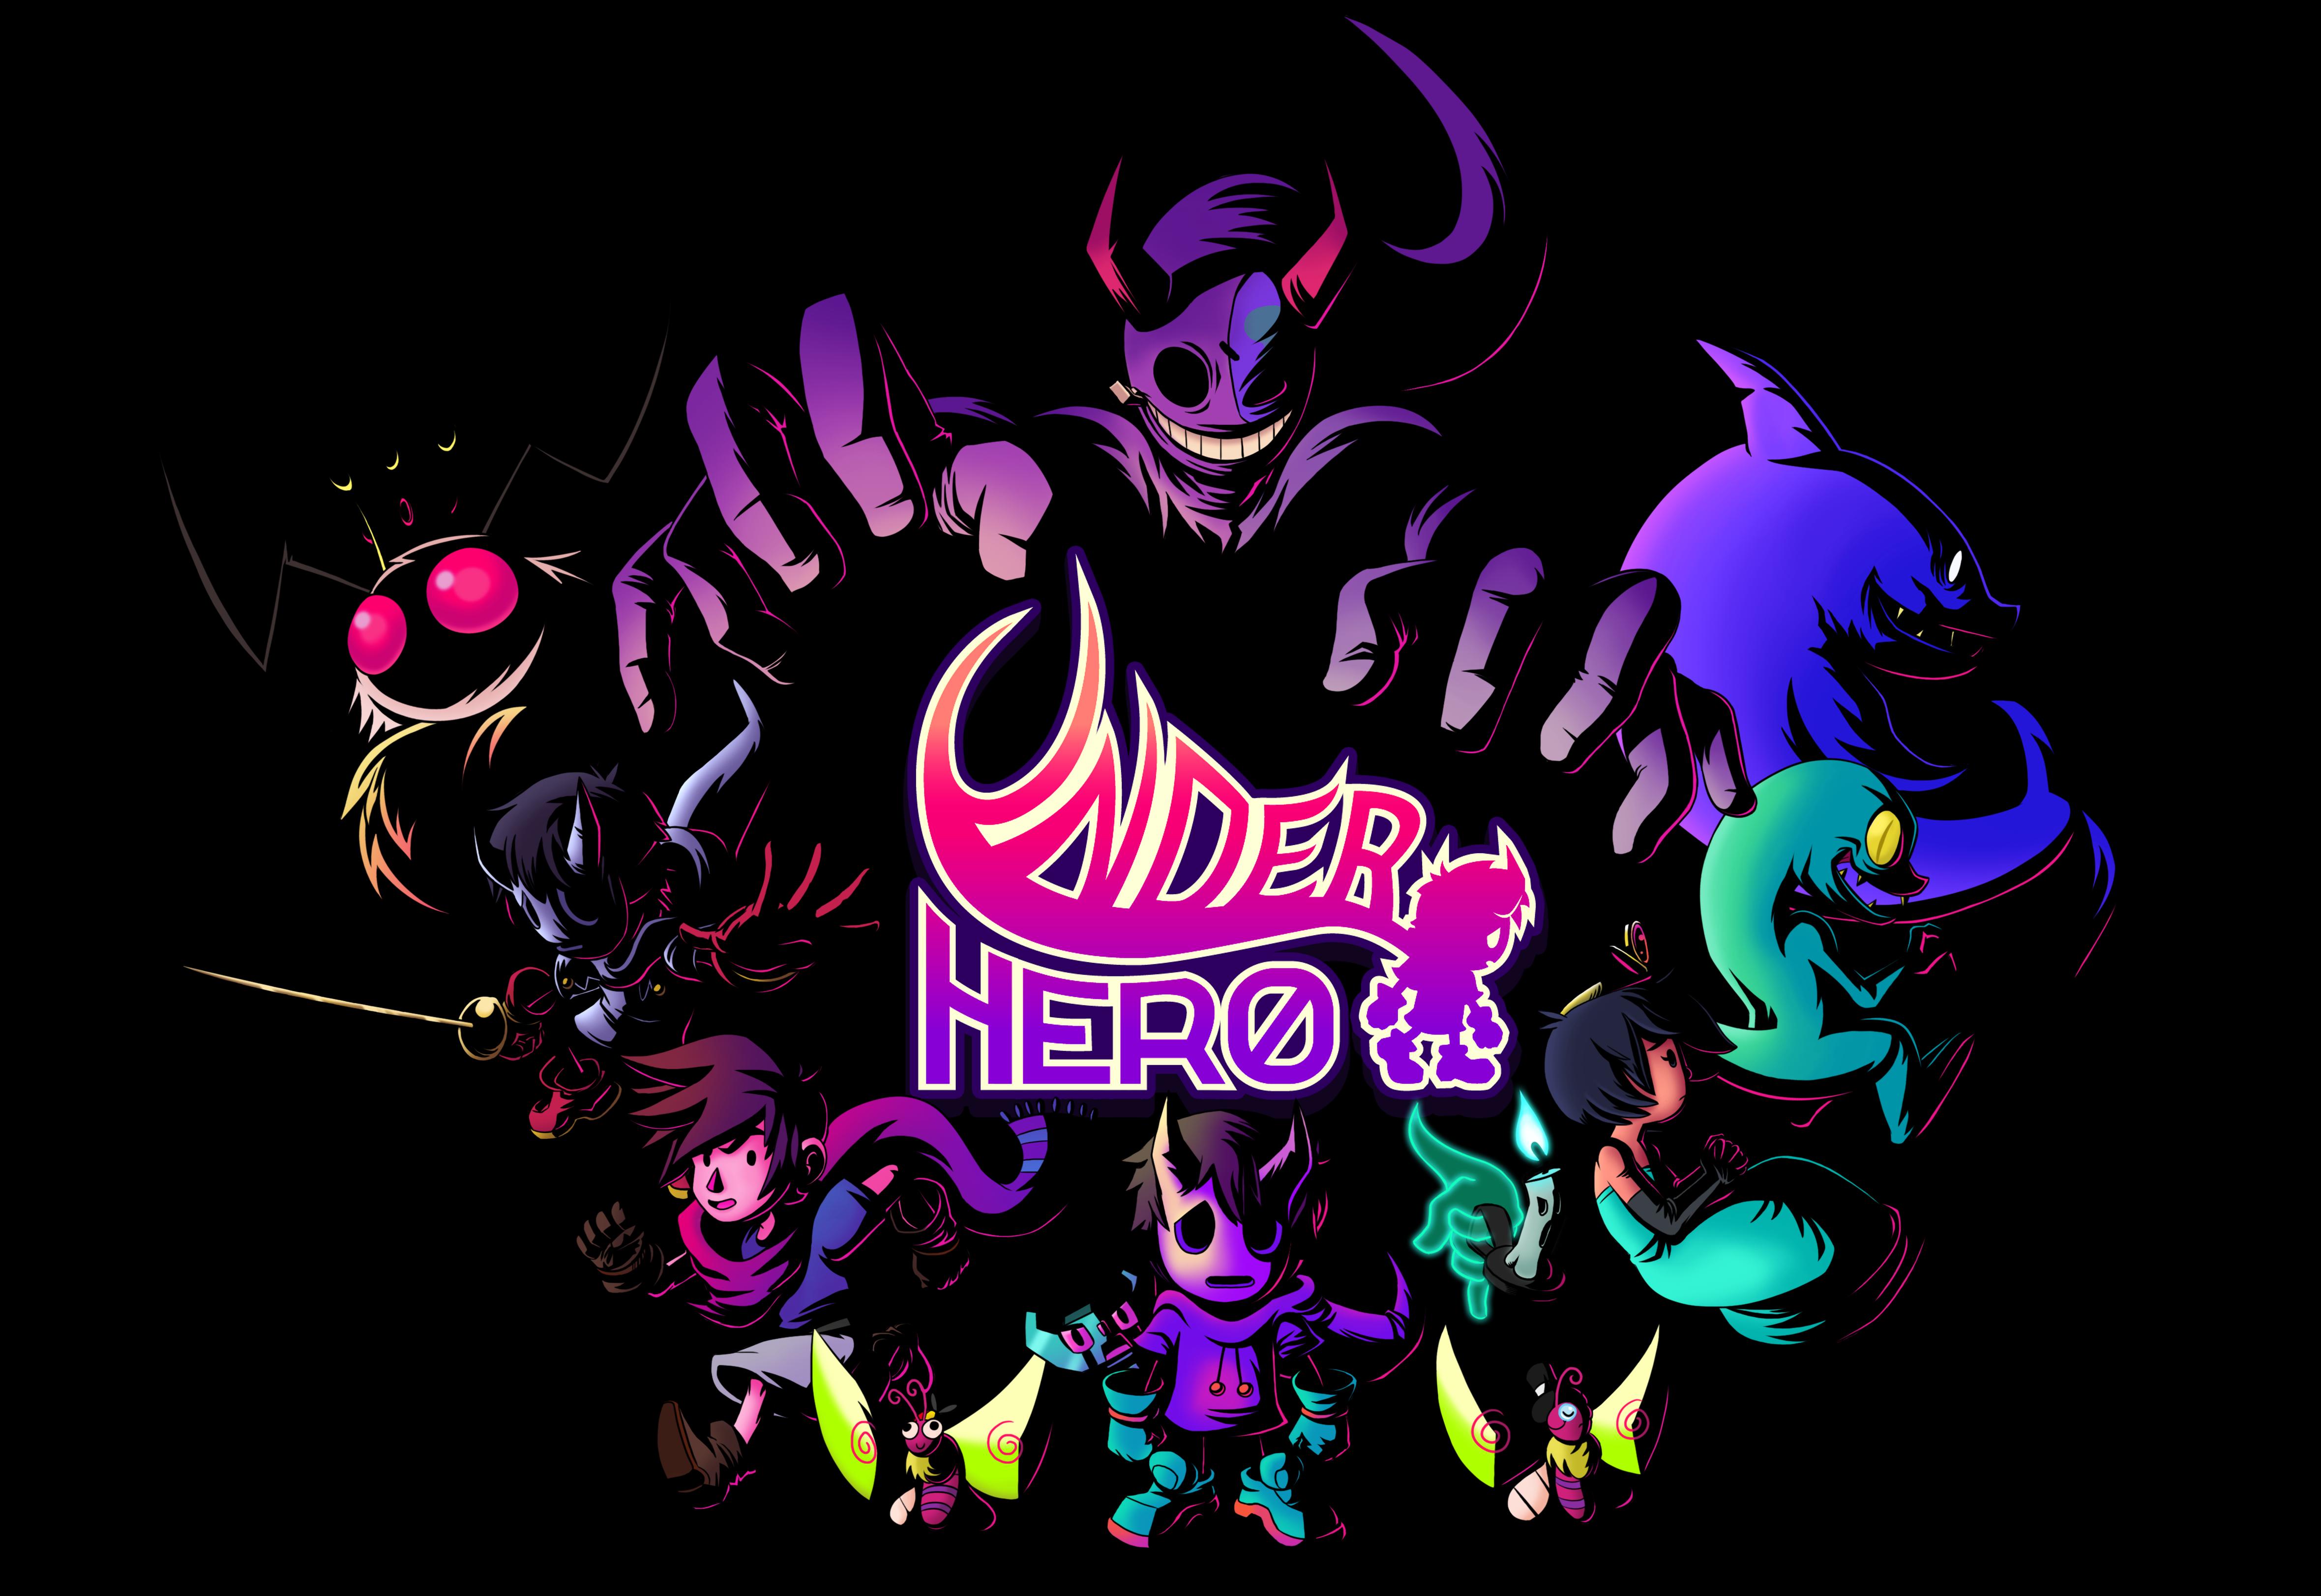 In Development - Underhero